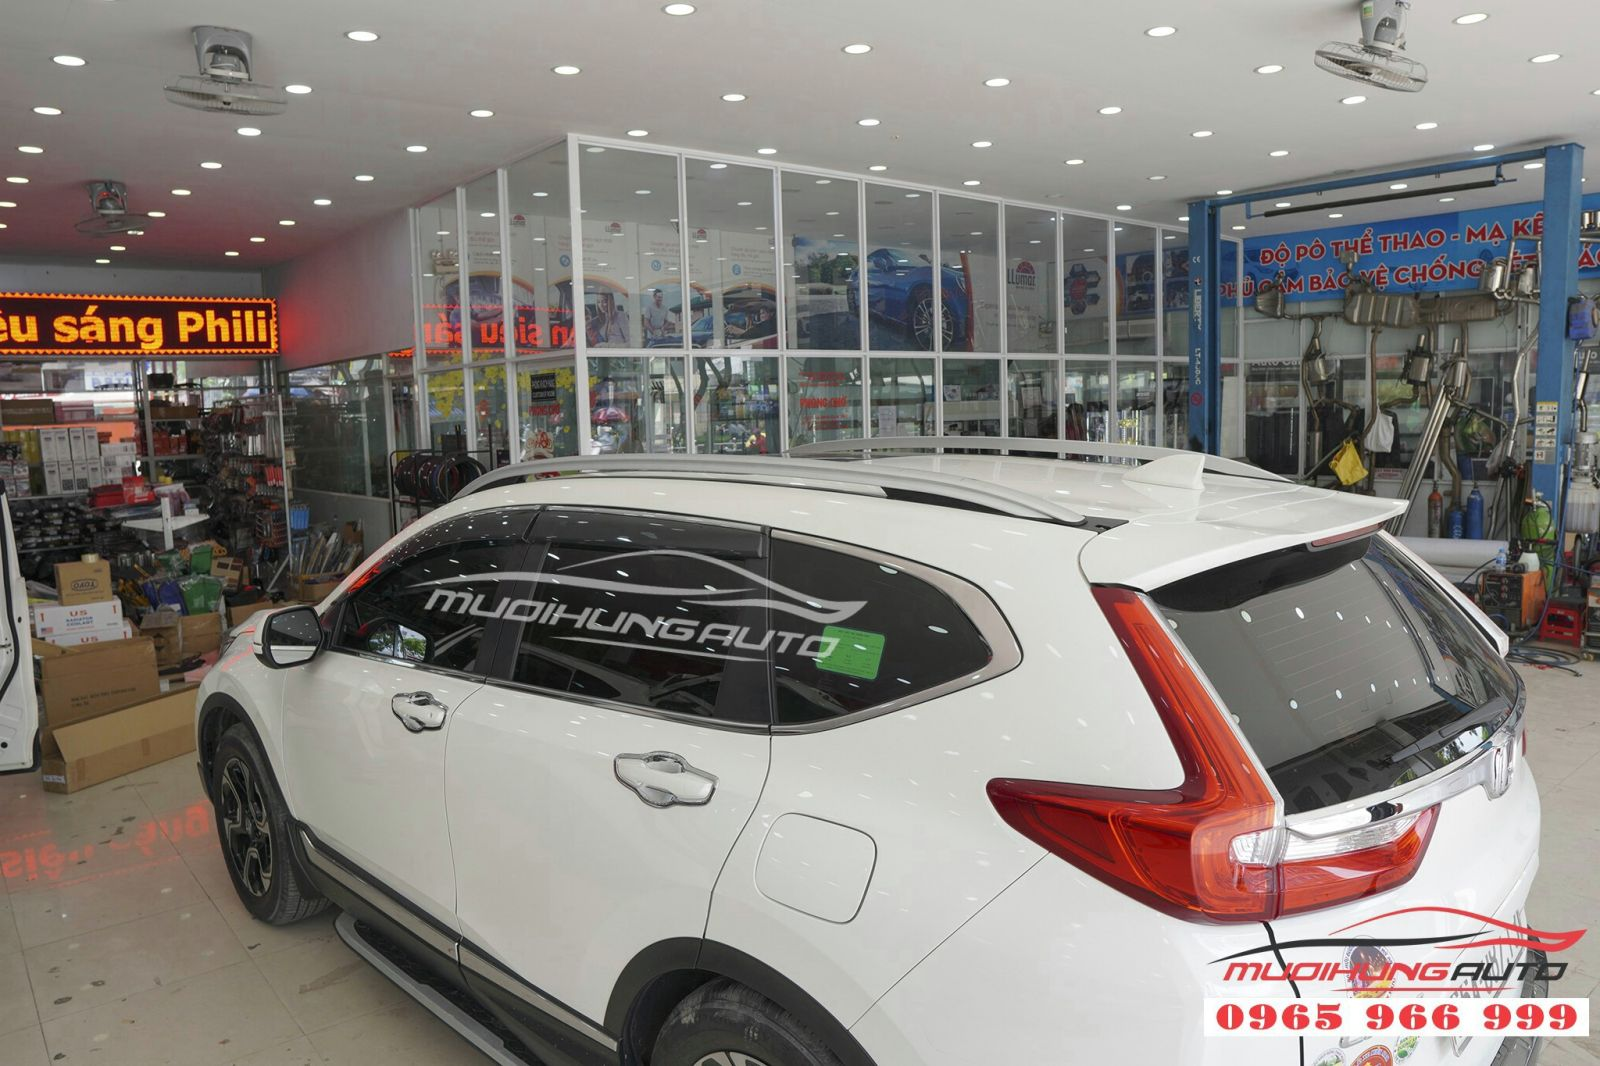 Lắp thanh giá nóc cao cho Honda CRV 2019 giá rẻ 12